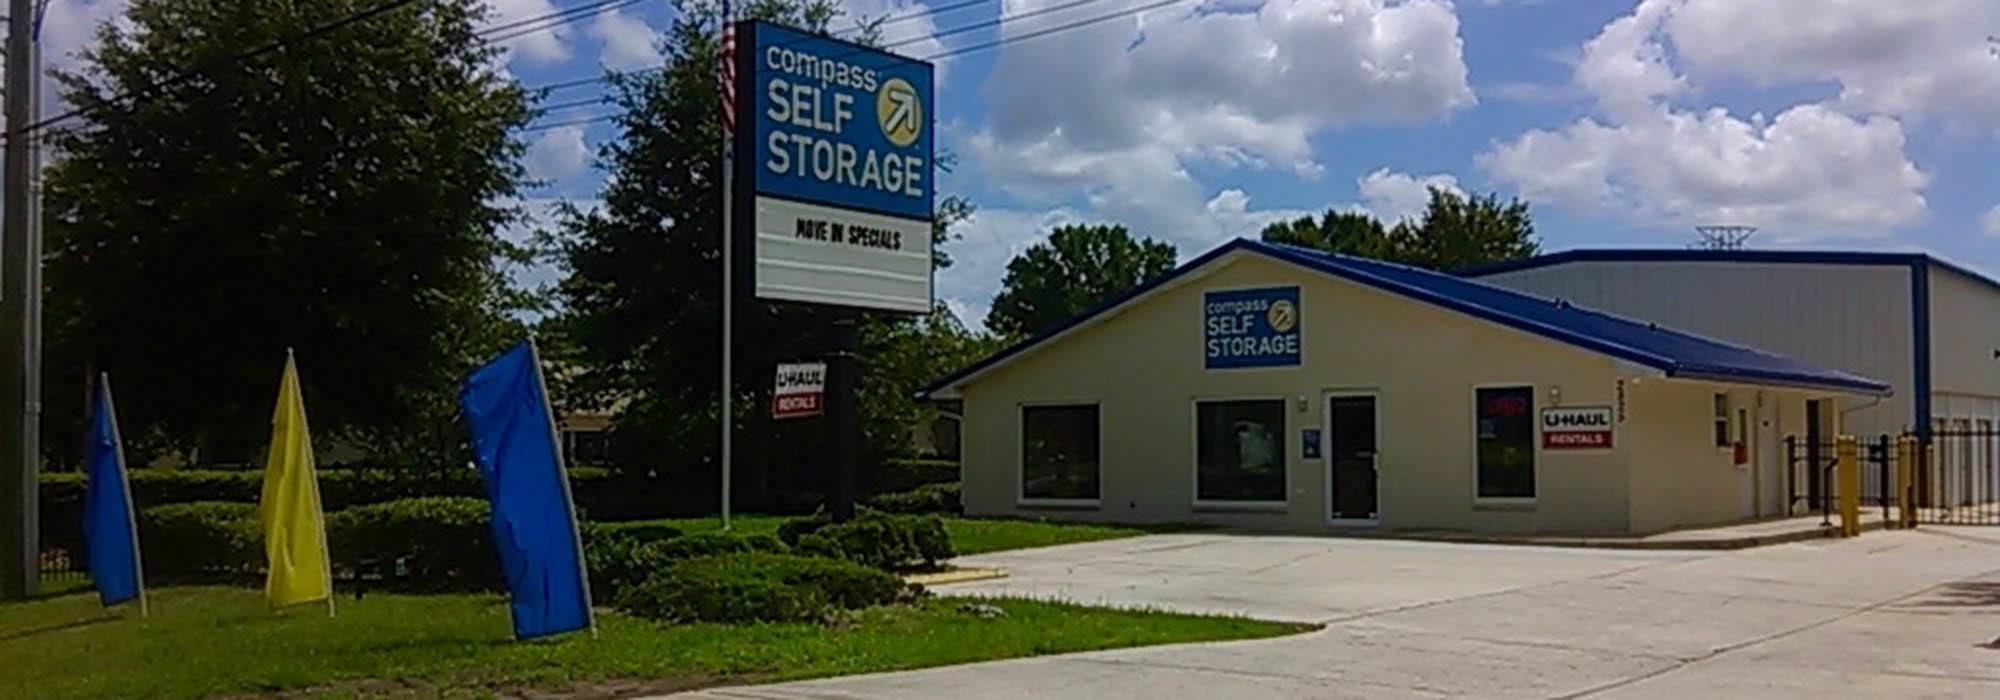 Self storage in Jacksonville FL